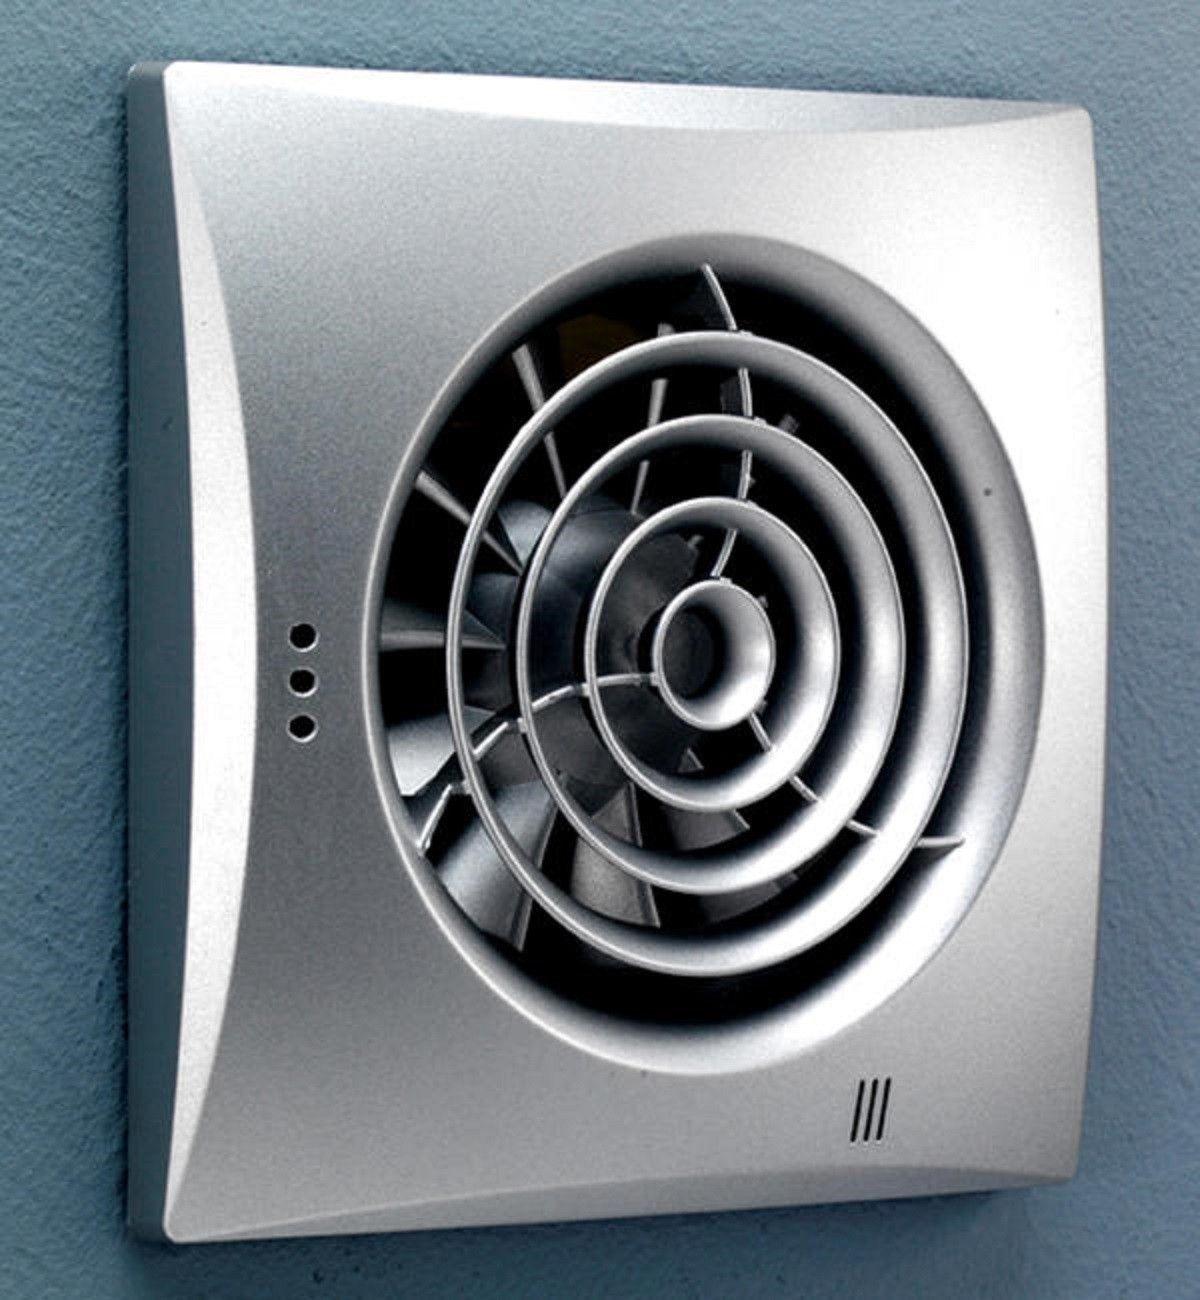 fan home wall ventilator ceiling extractor itm mounted bathroom exhaust